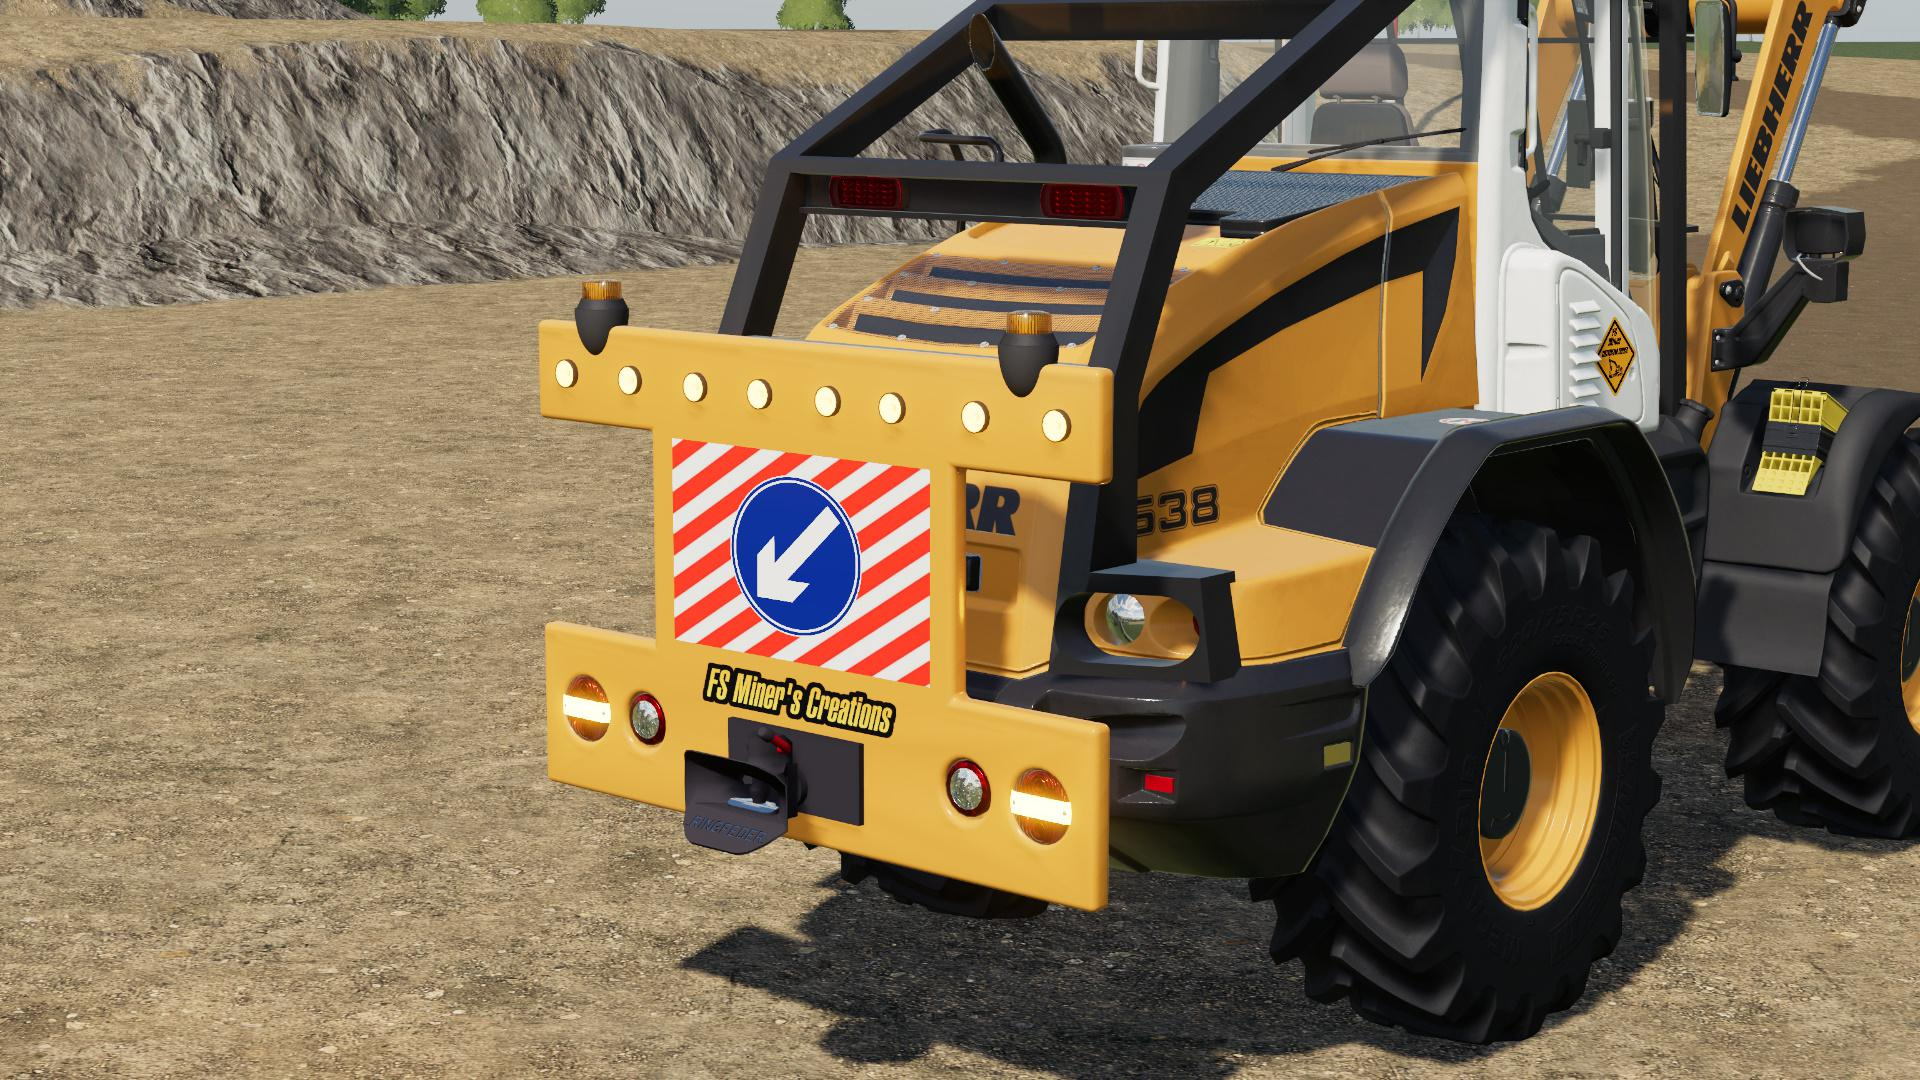 FS19 - Rear Warning Sign for Wheel Loaders V1.0